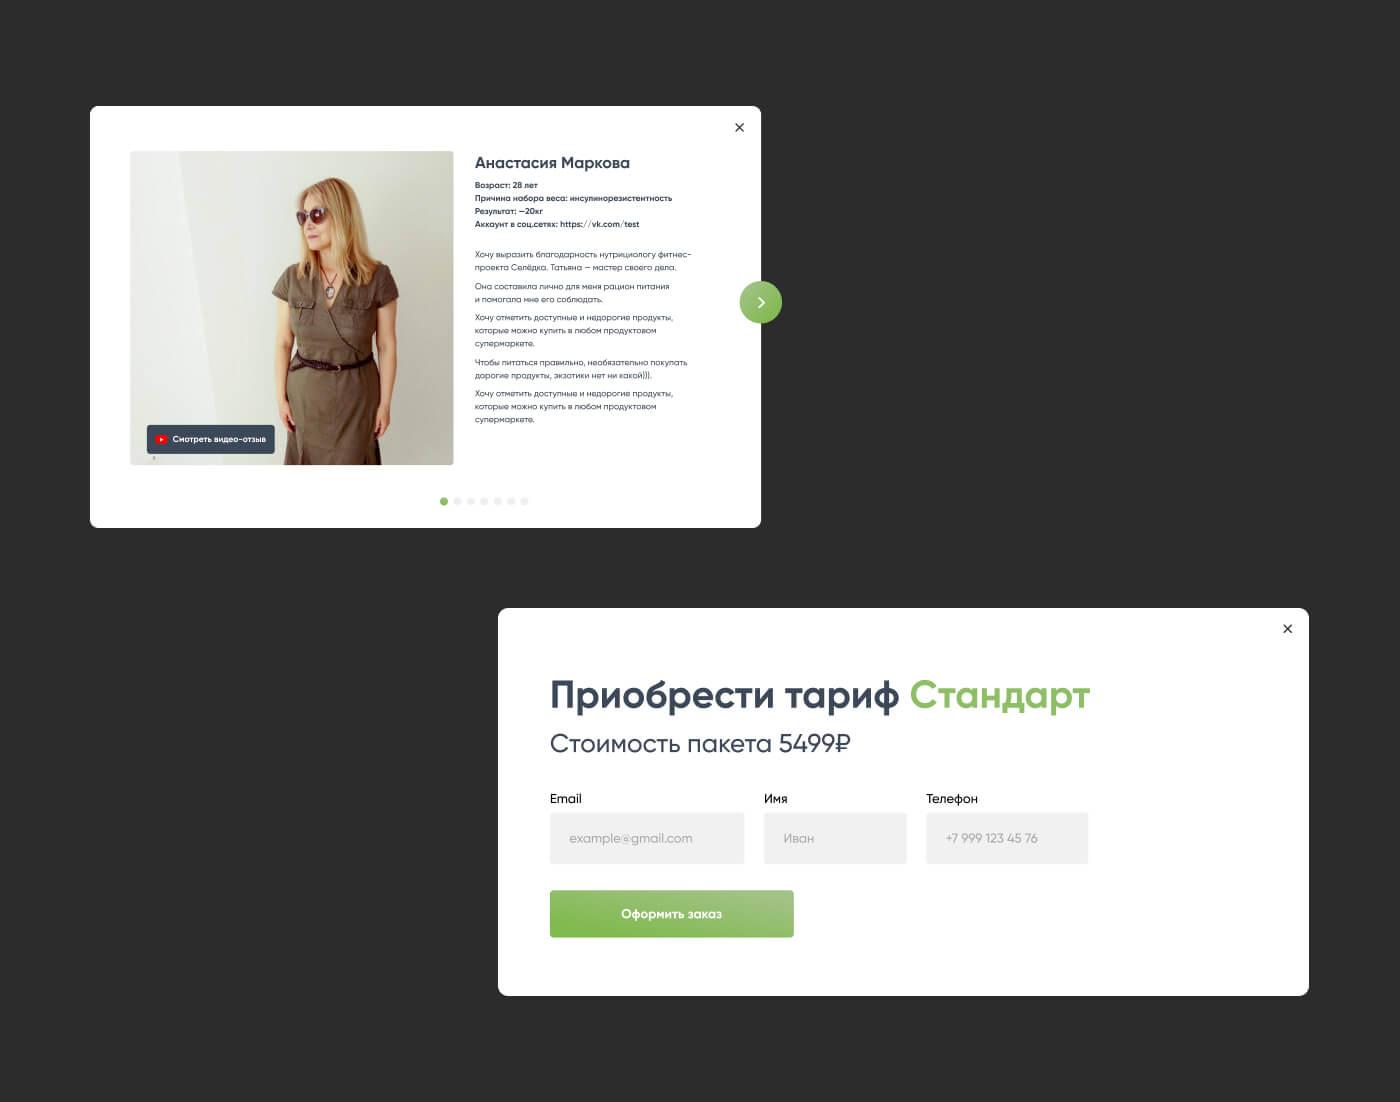 Дизайн сайта для курса TanyaChange 4